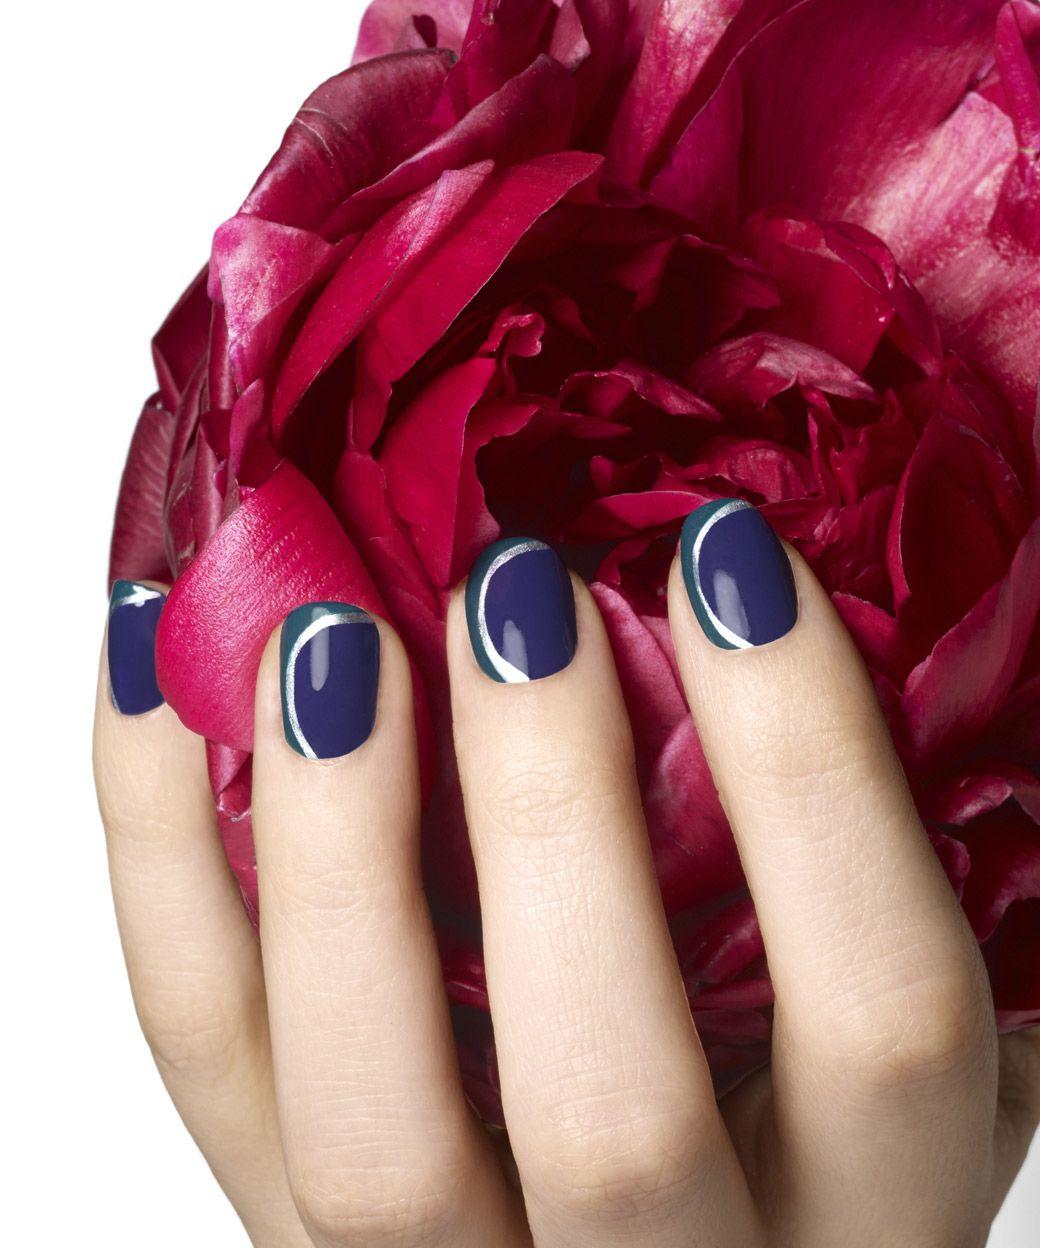 Nokti Essie Alessandro Crisnail Pn Jessica Manikir Lakovi Nega Nadogradnja Izlivanje Korekcija Salonadut Boje Leto More Nails Beauty